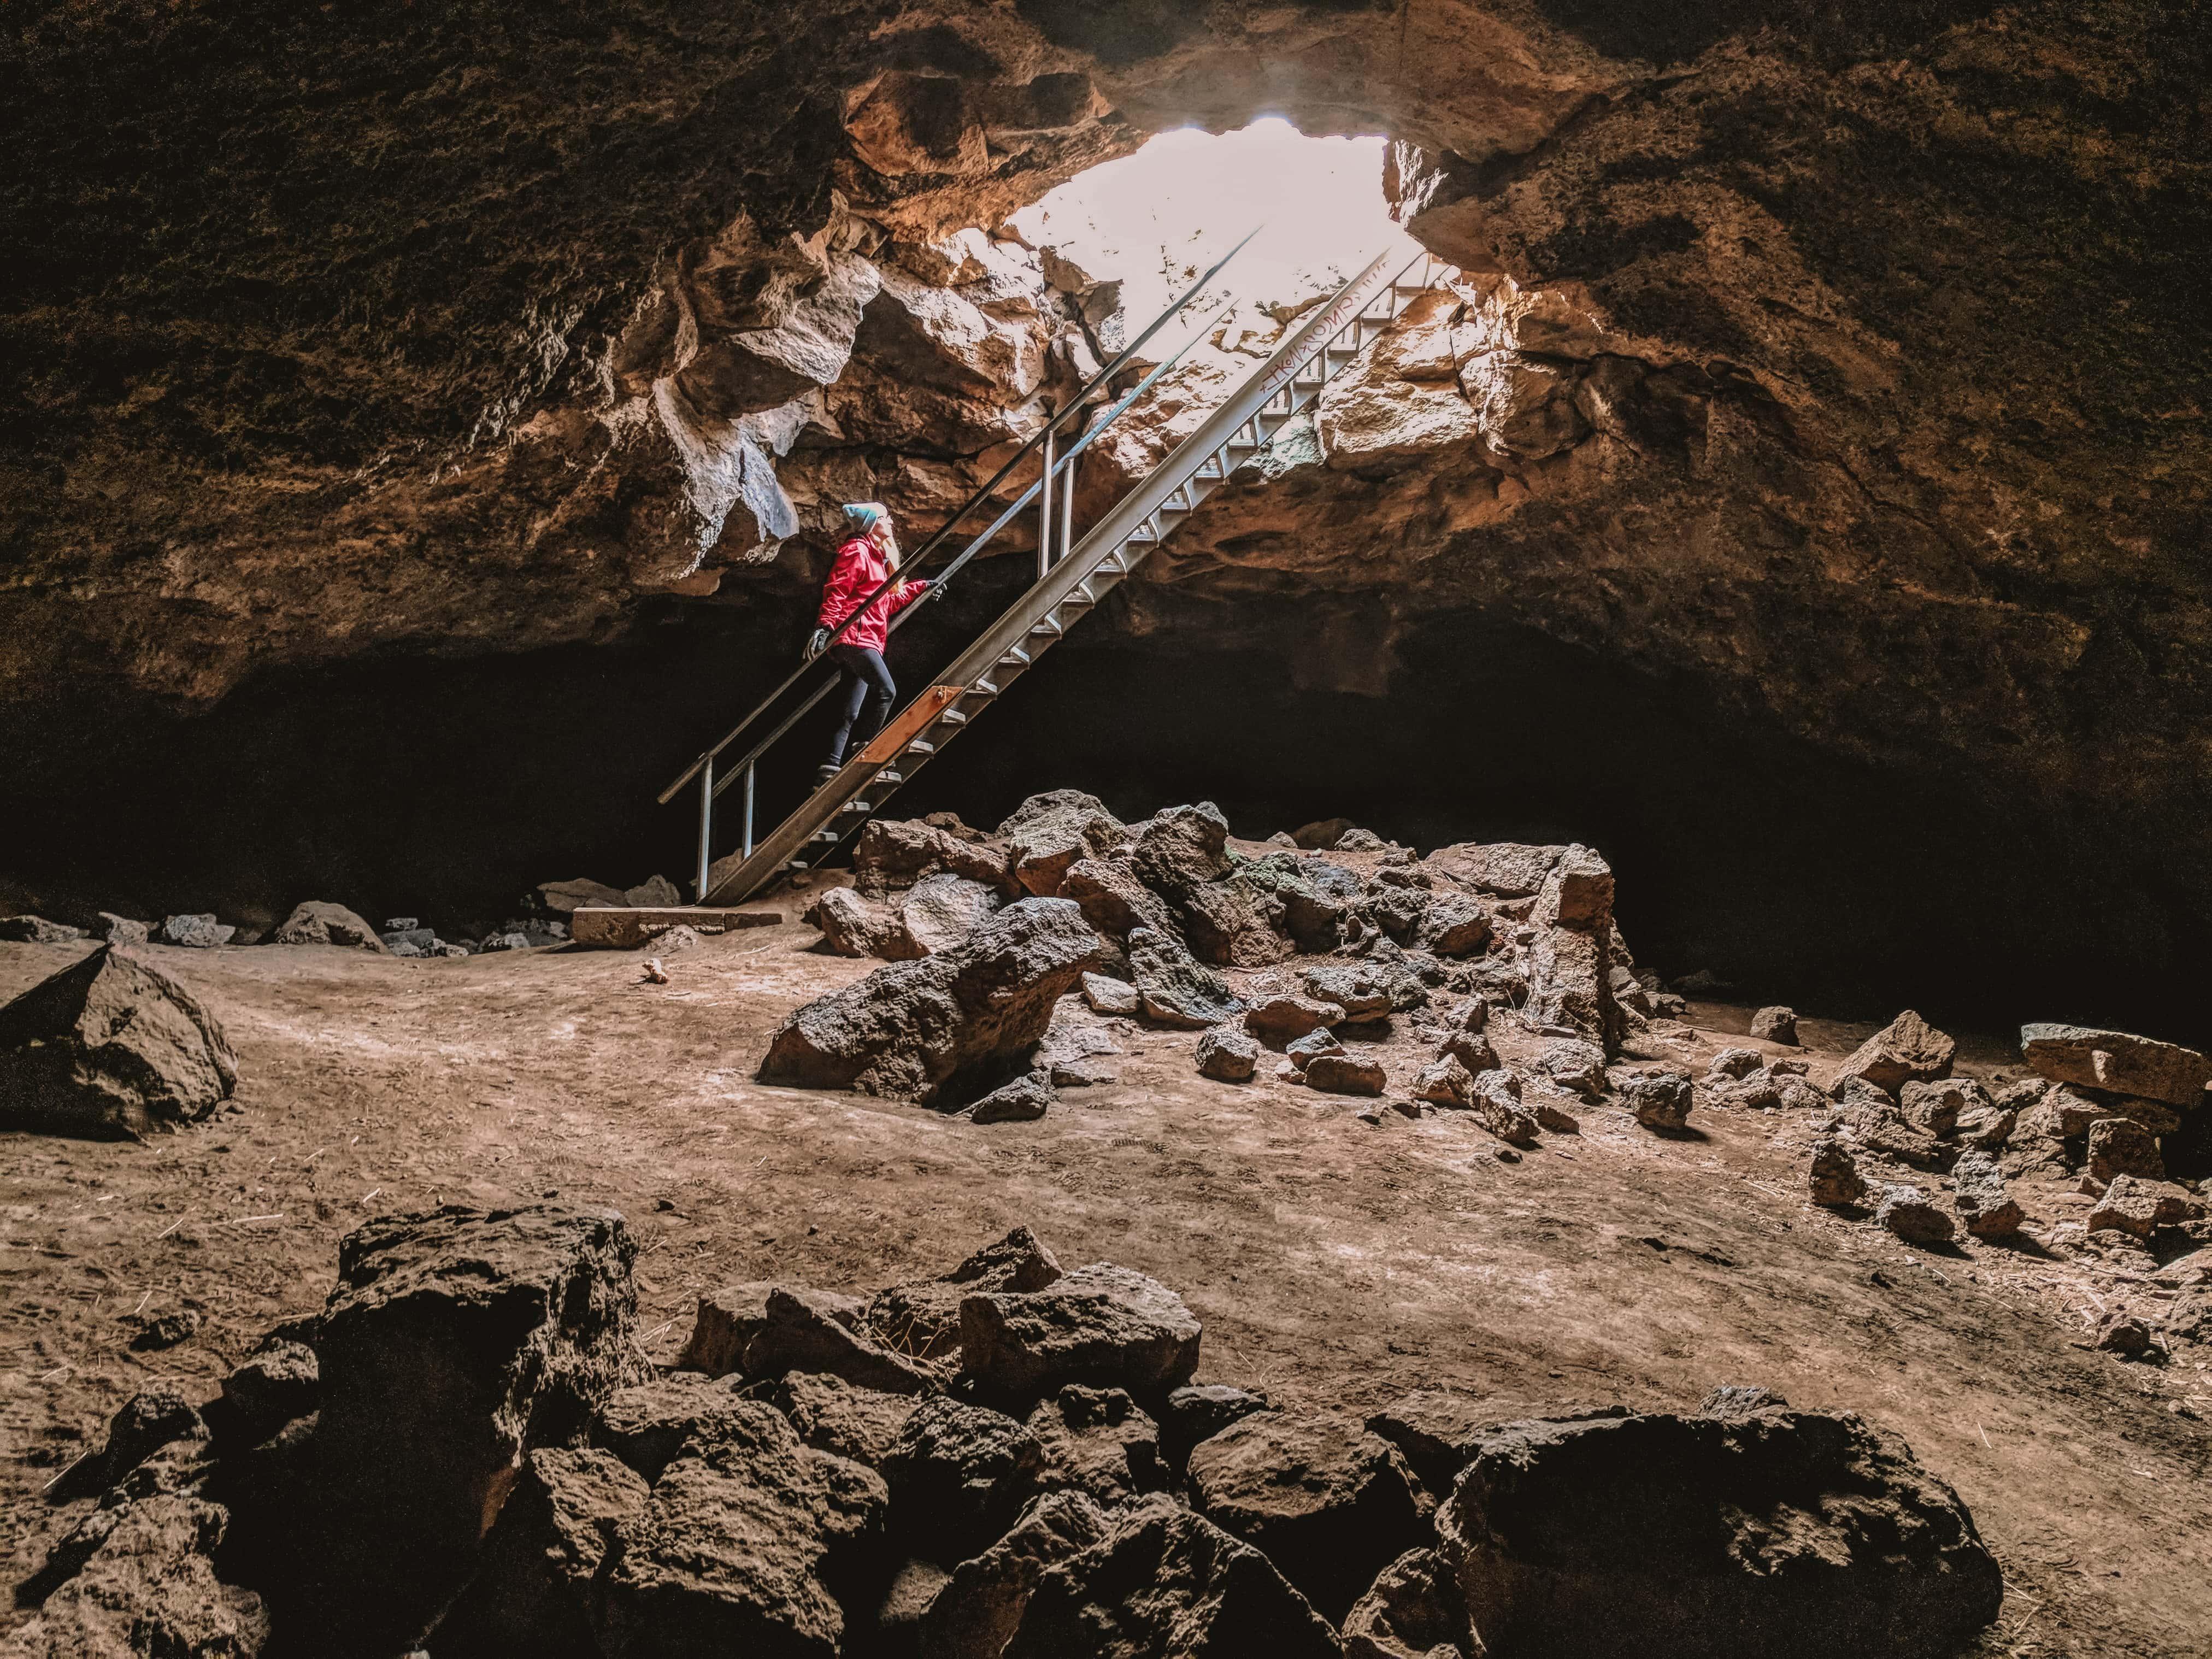 Boyd Cave - Central Oregon